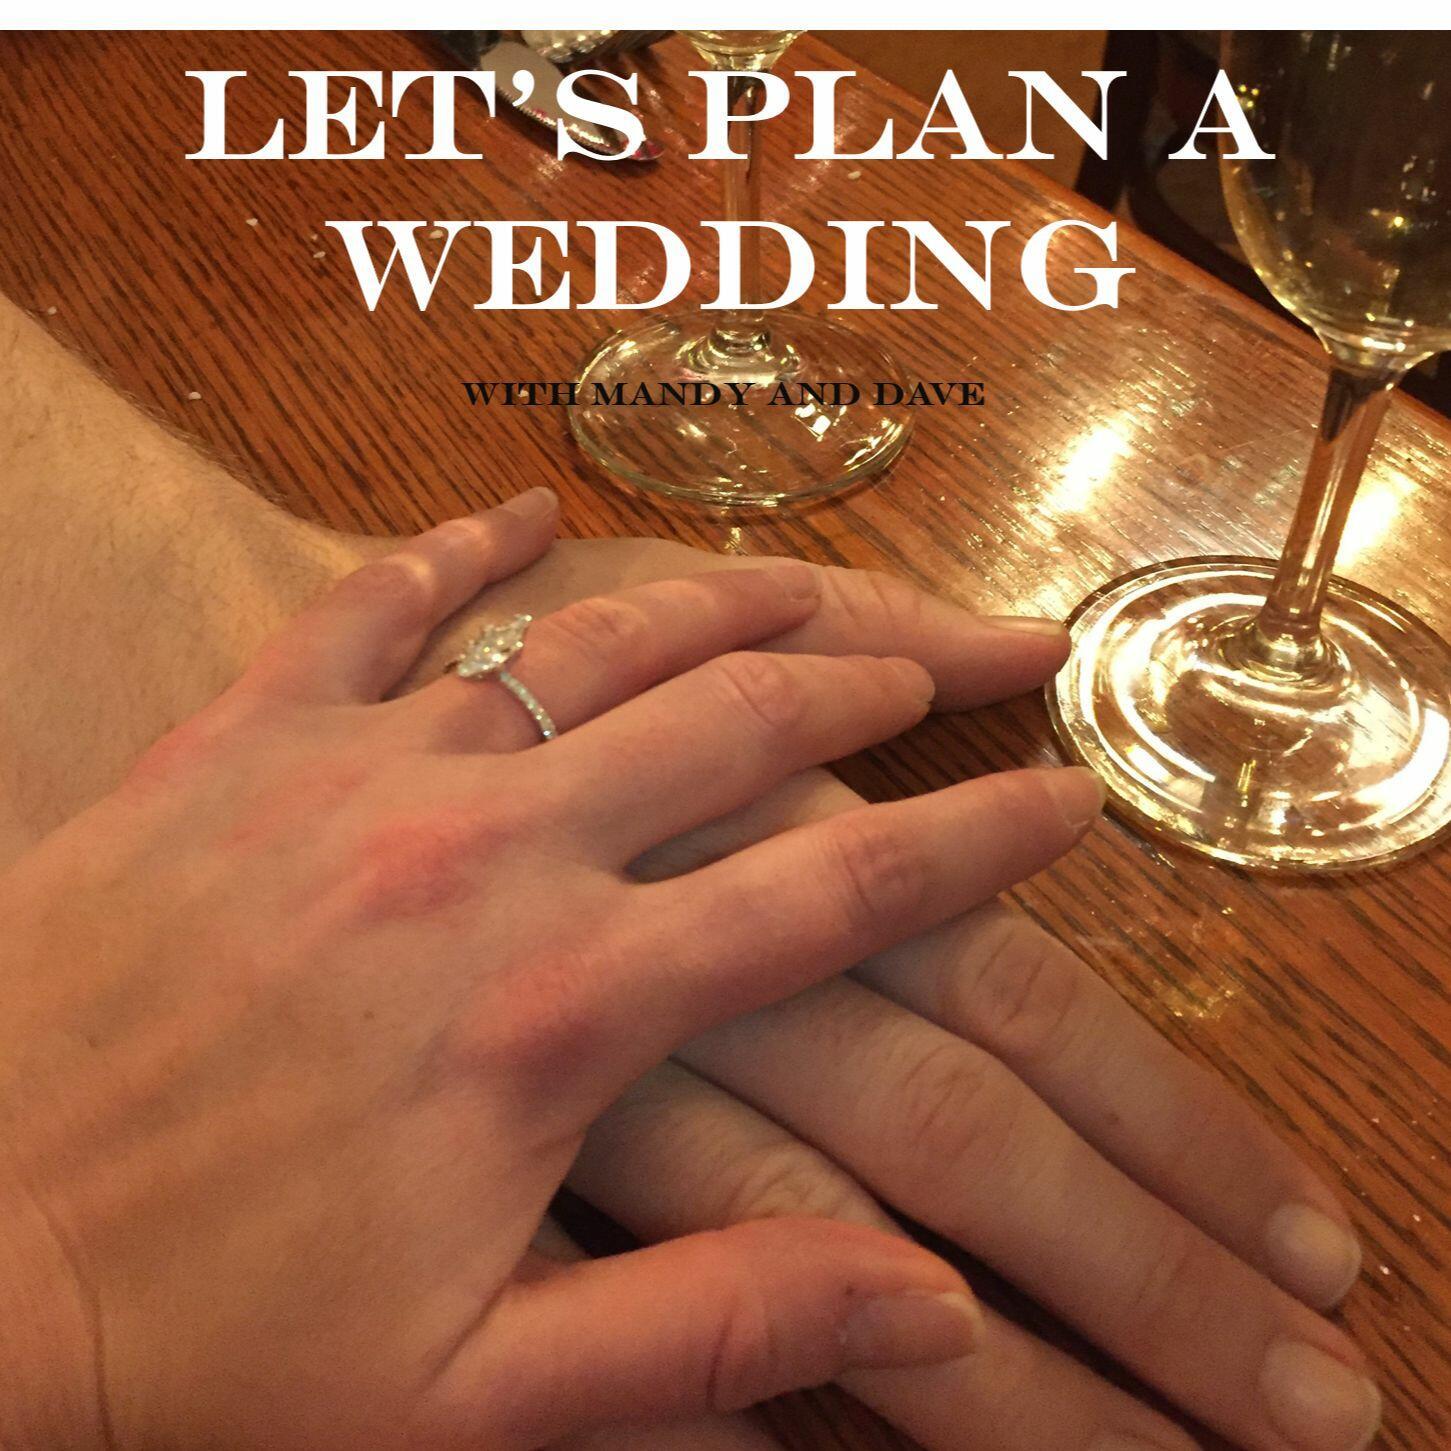 Let's Plan A Wedding